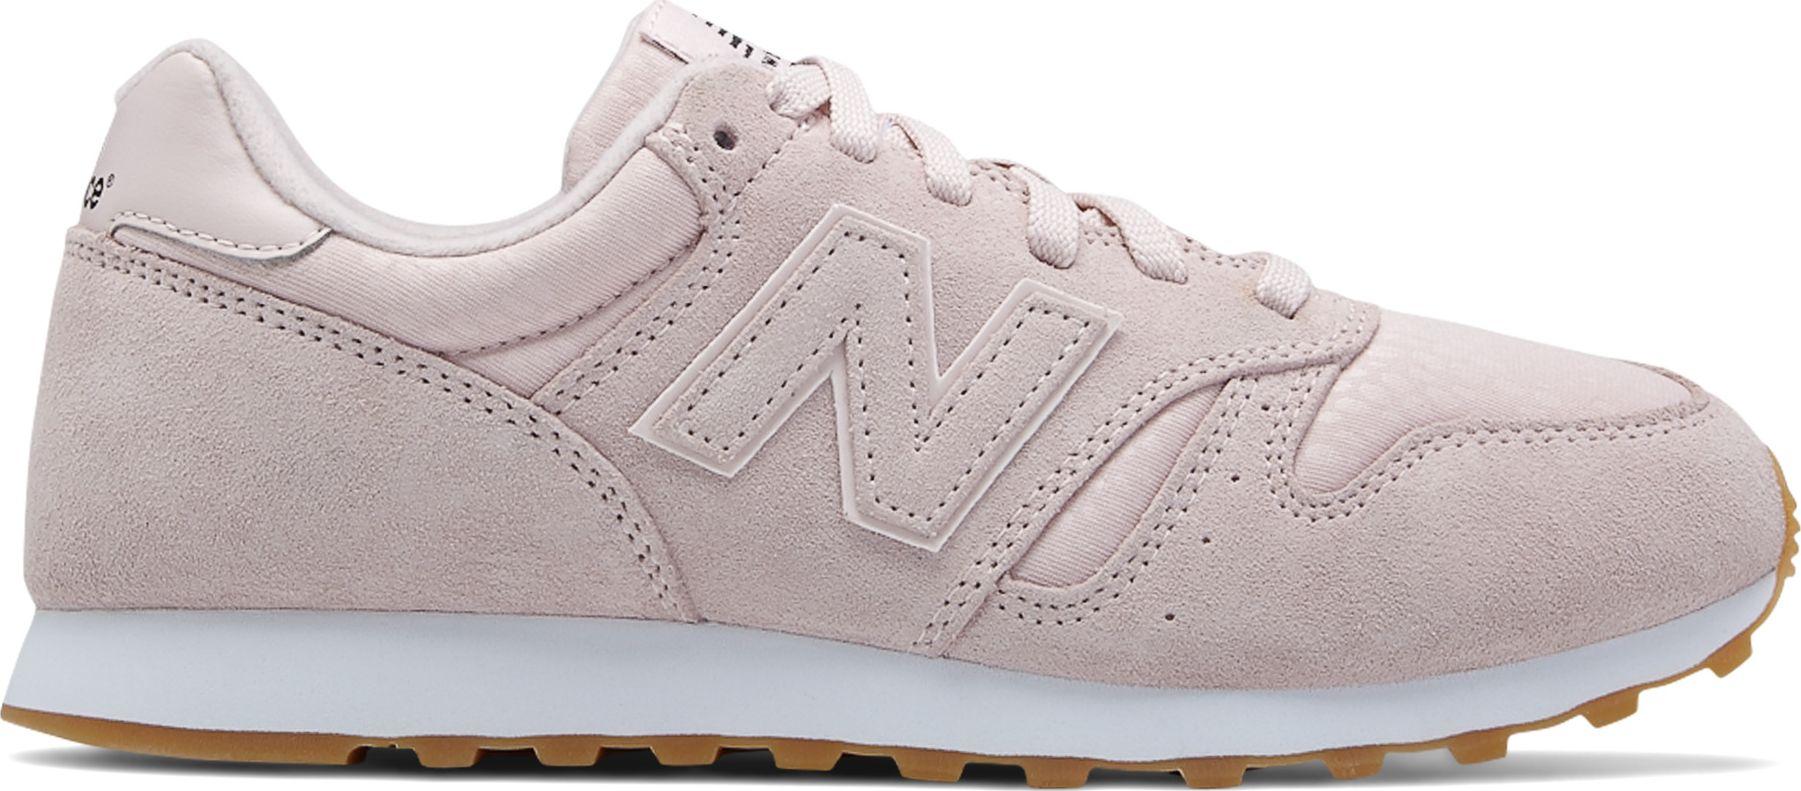 New Balance WL373 Pink 40